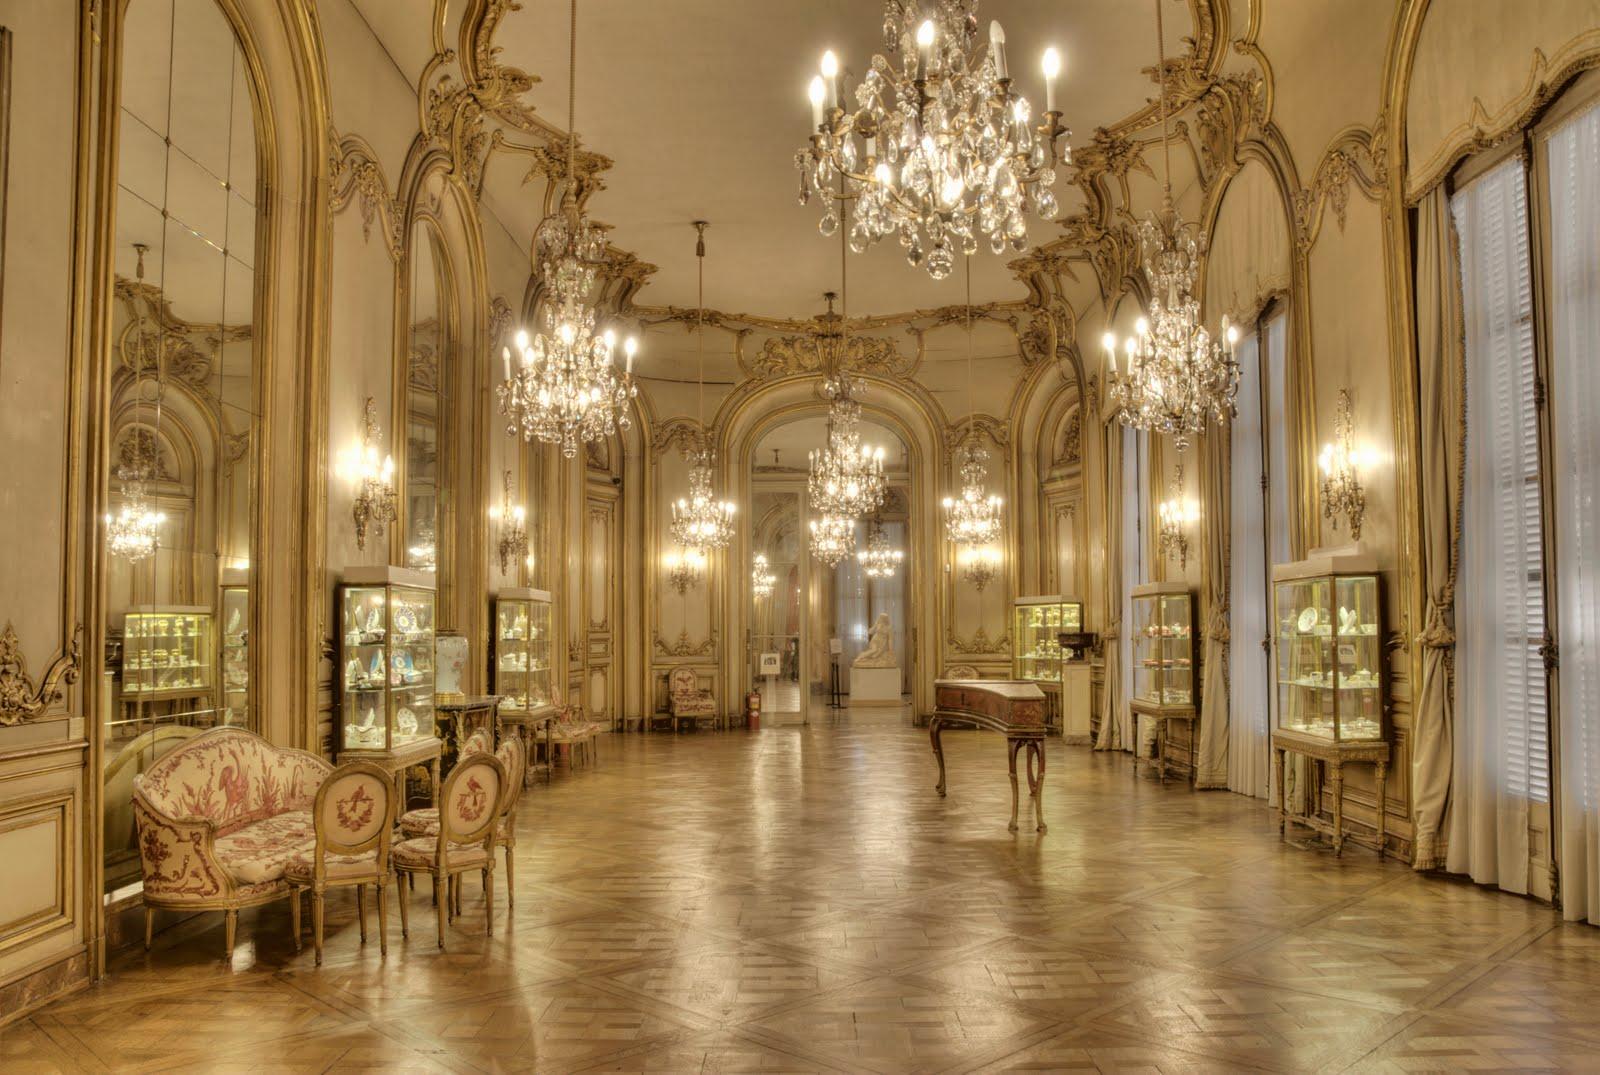 Fondos para fotomontajes profesionales imagui for Salon n 6 orleans